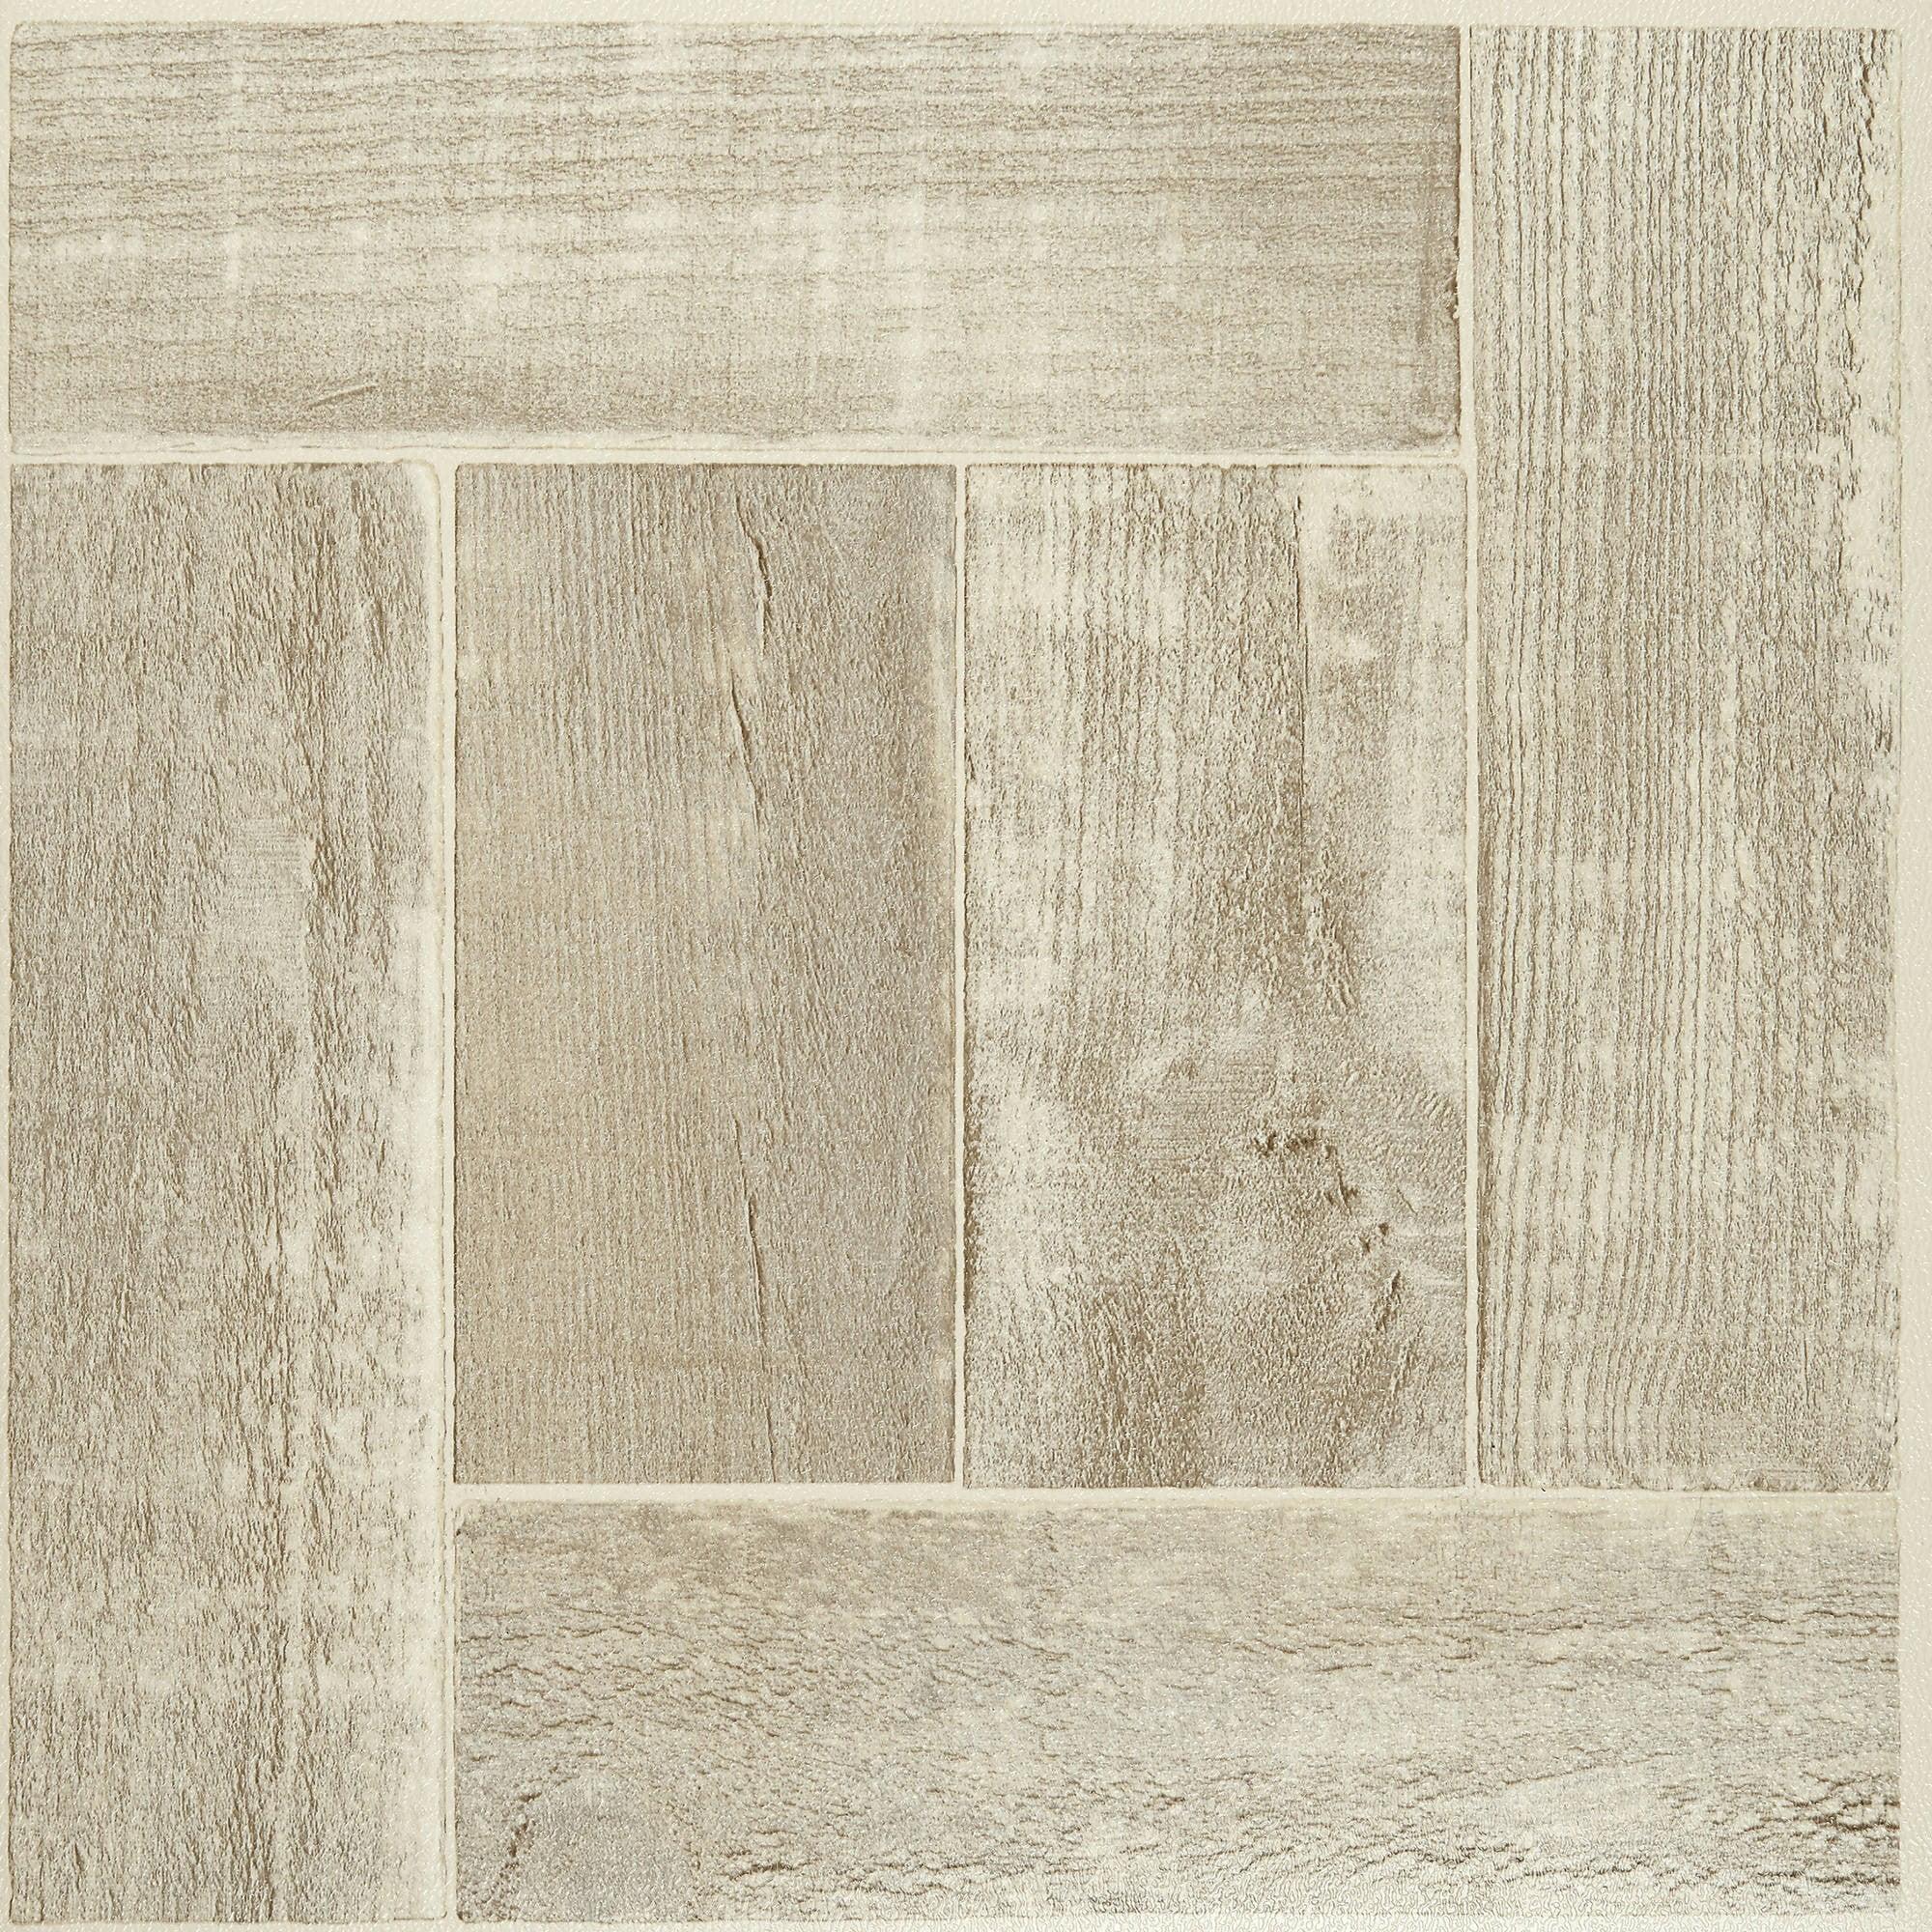 Nexus Saddlewood 12x12 Self Adhesive Vinyl Floor Tile - 20 Tiles/20 ...